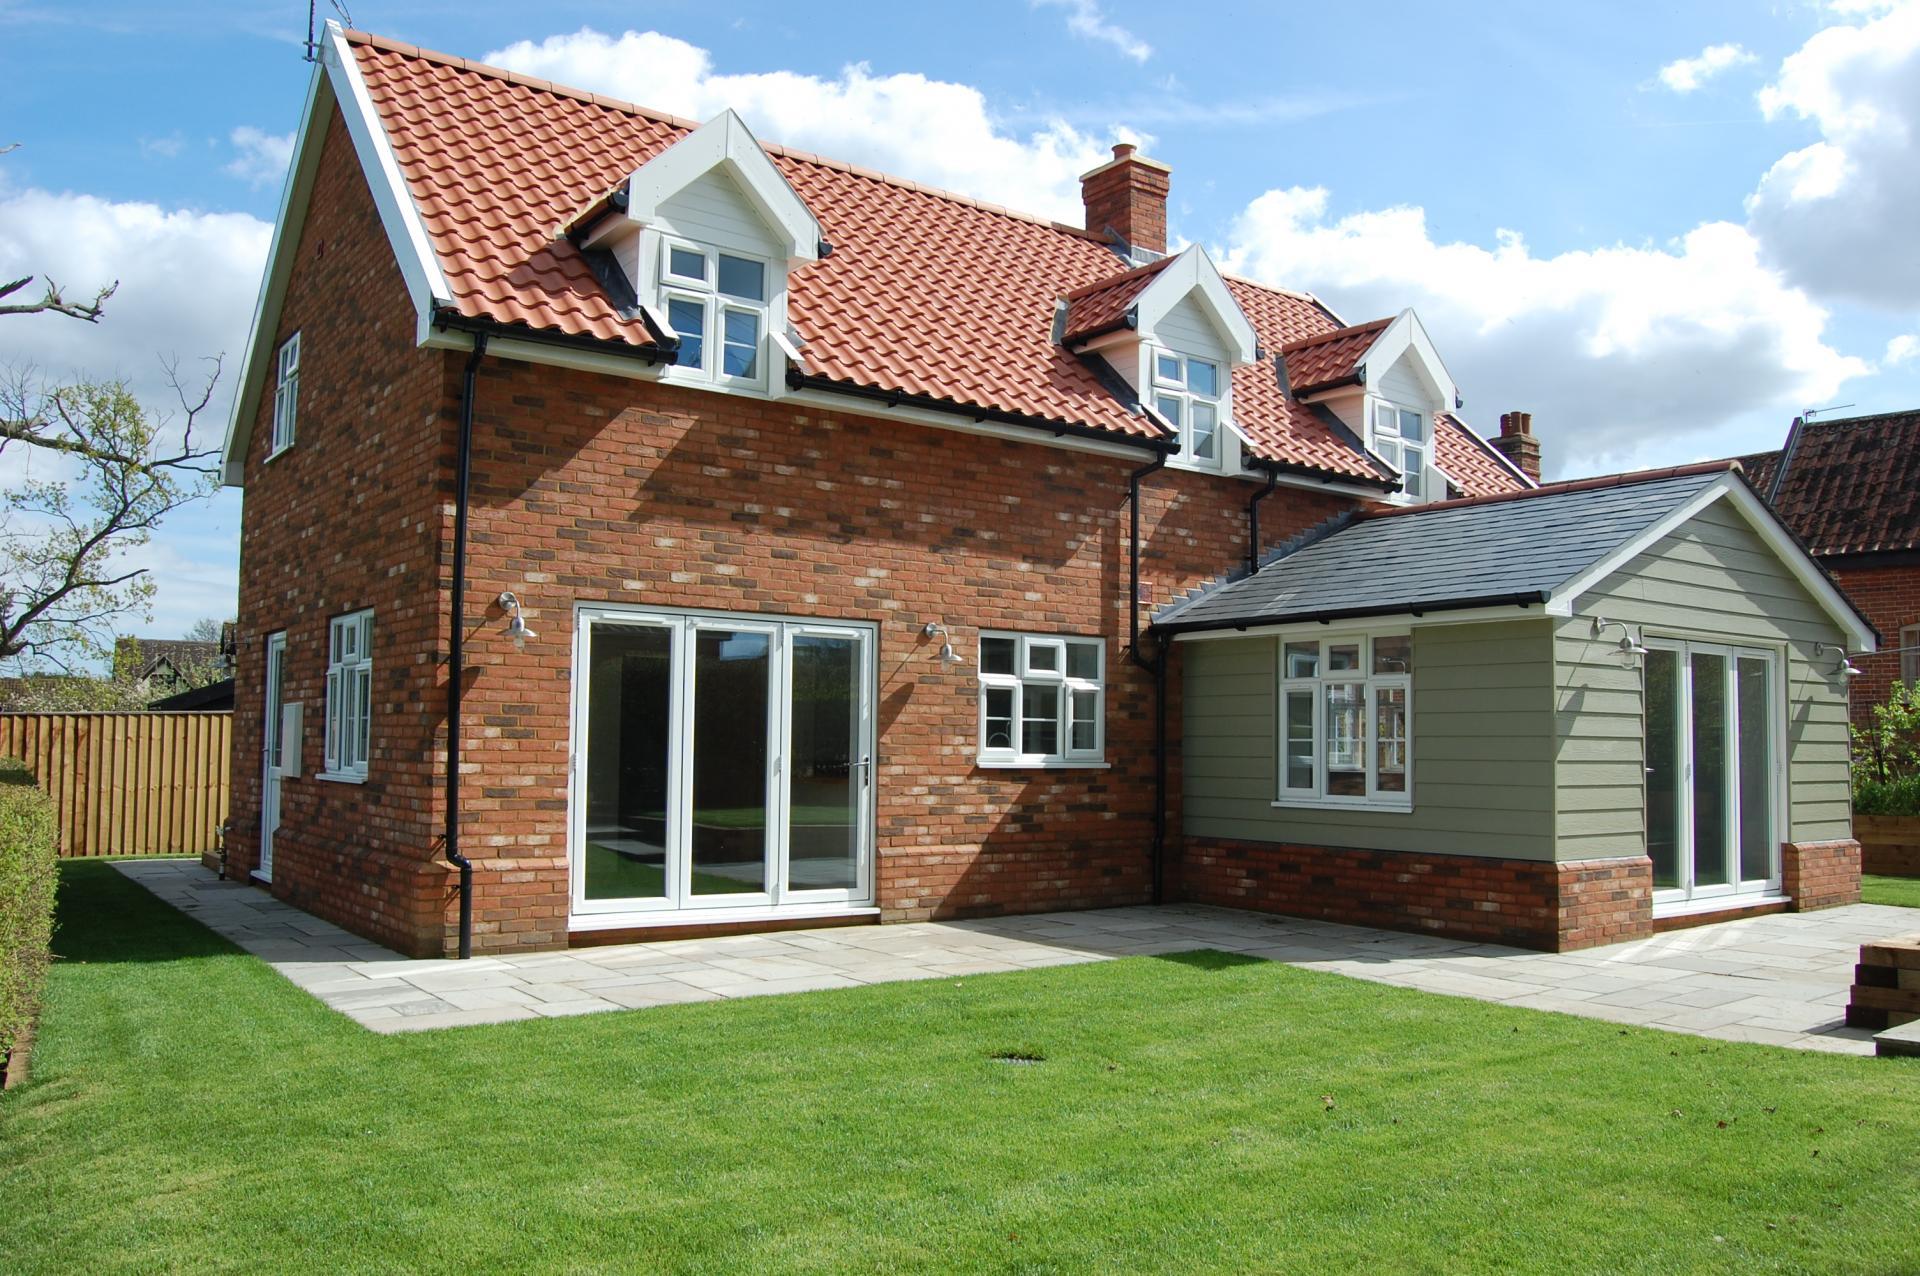 Town Of Woodbridge Property Tax